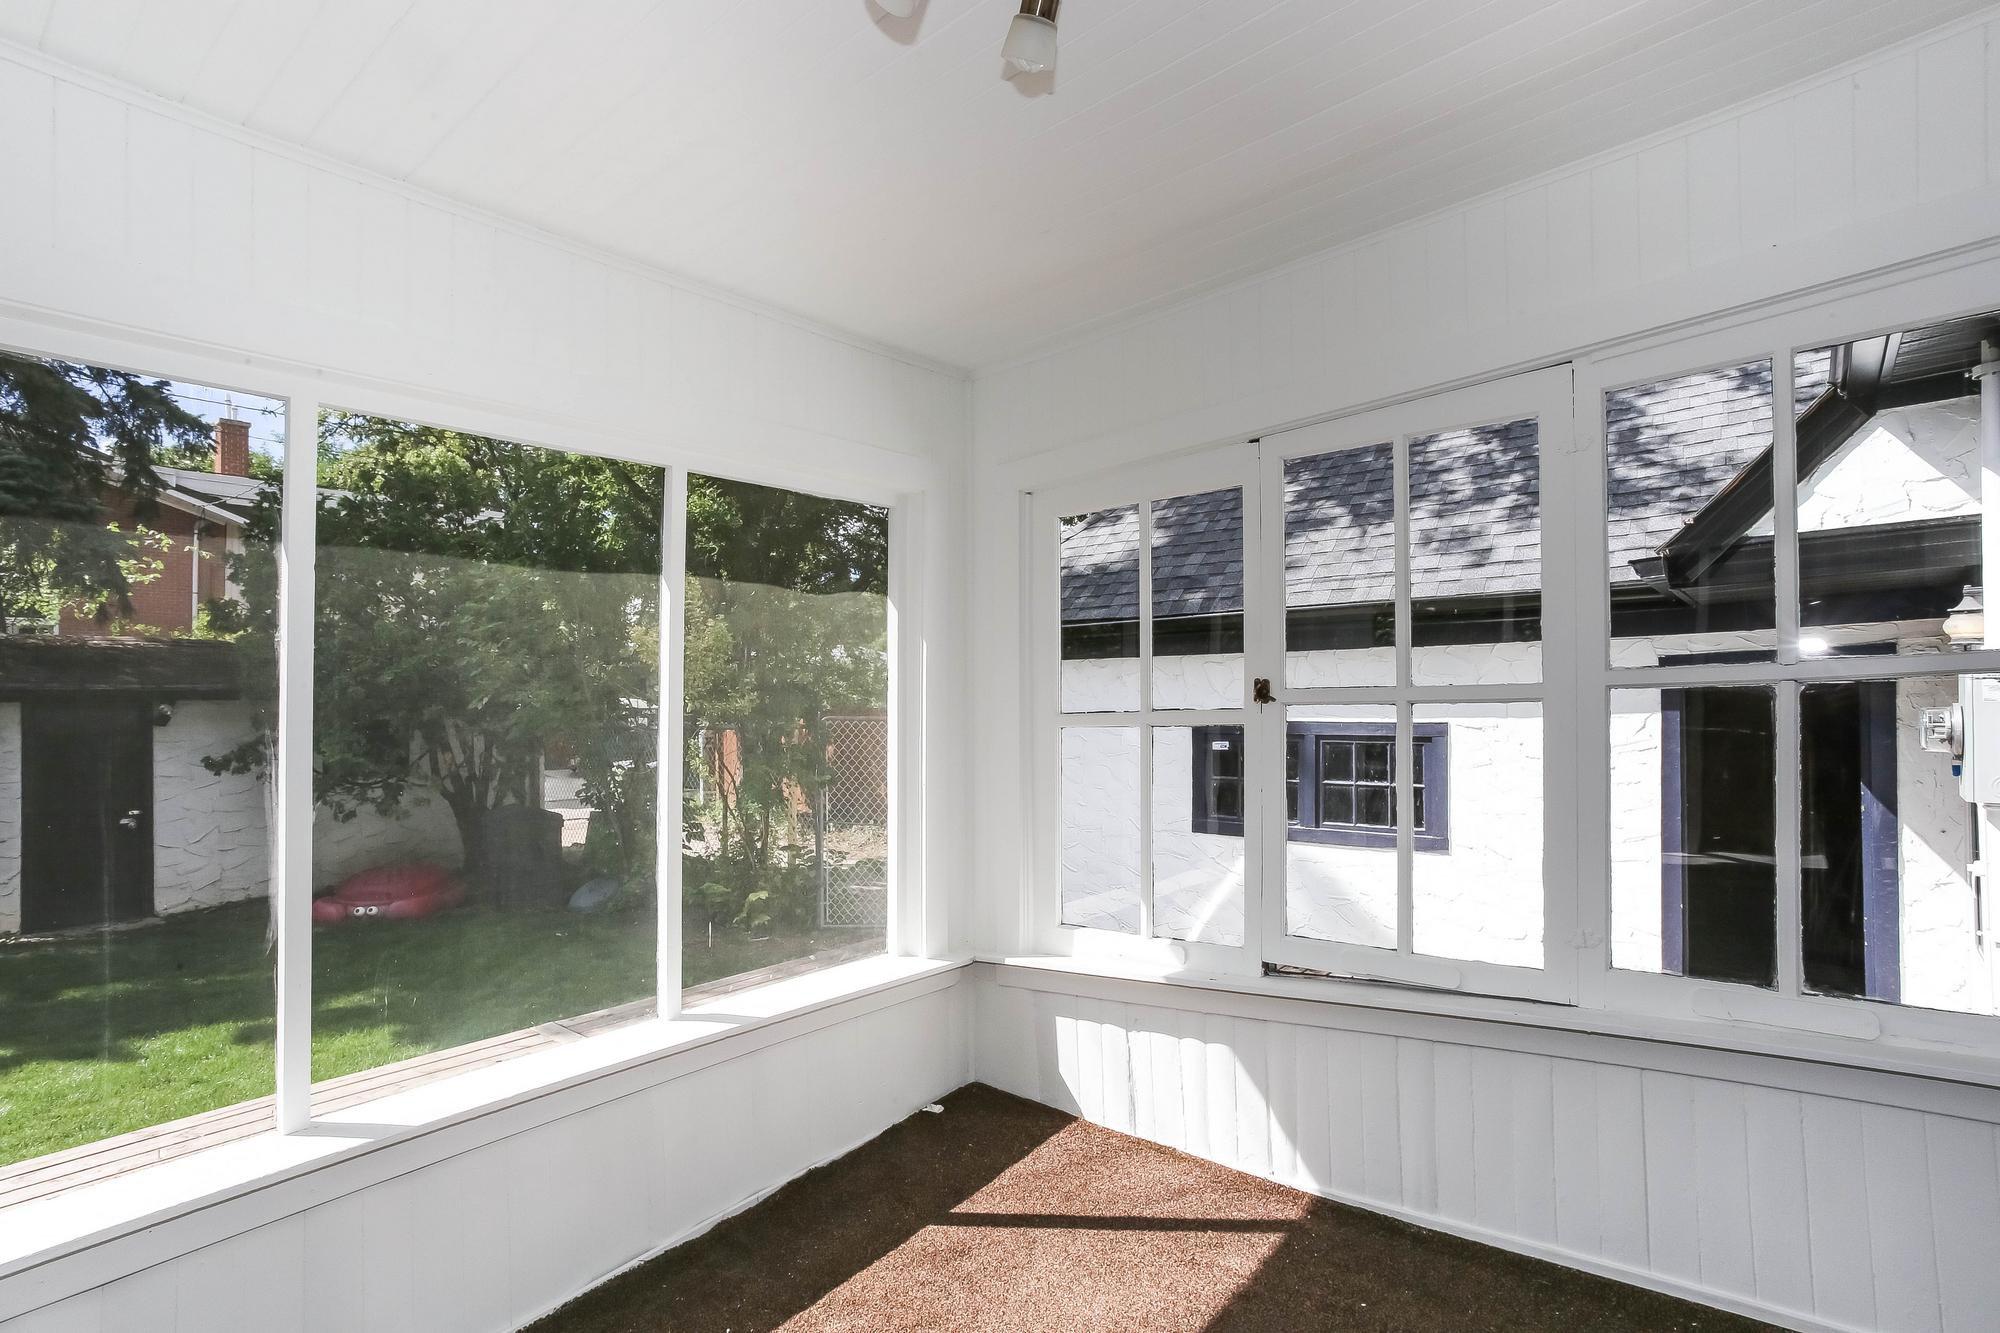 Photo 10: Photos: 155 Borebank Street in Winnipeg: River Heights Single Family Detached for sale (1C)  : MLS®# 202017166